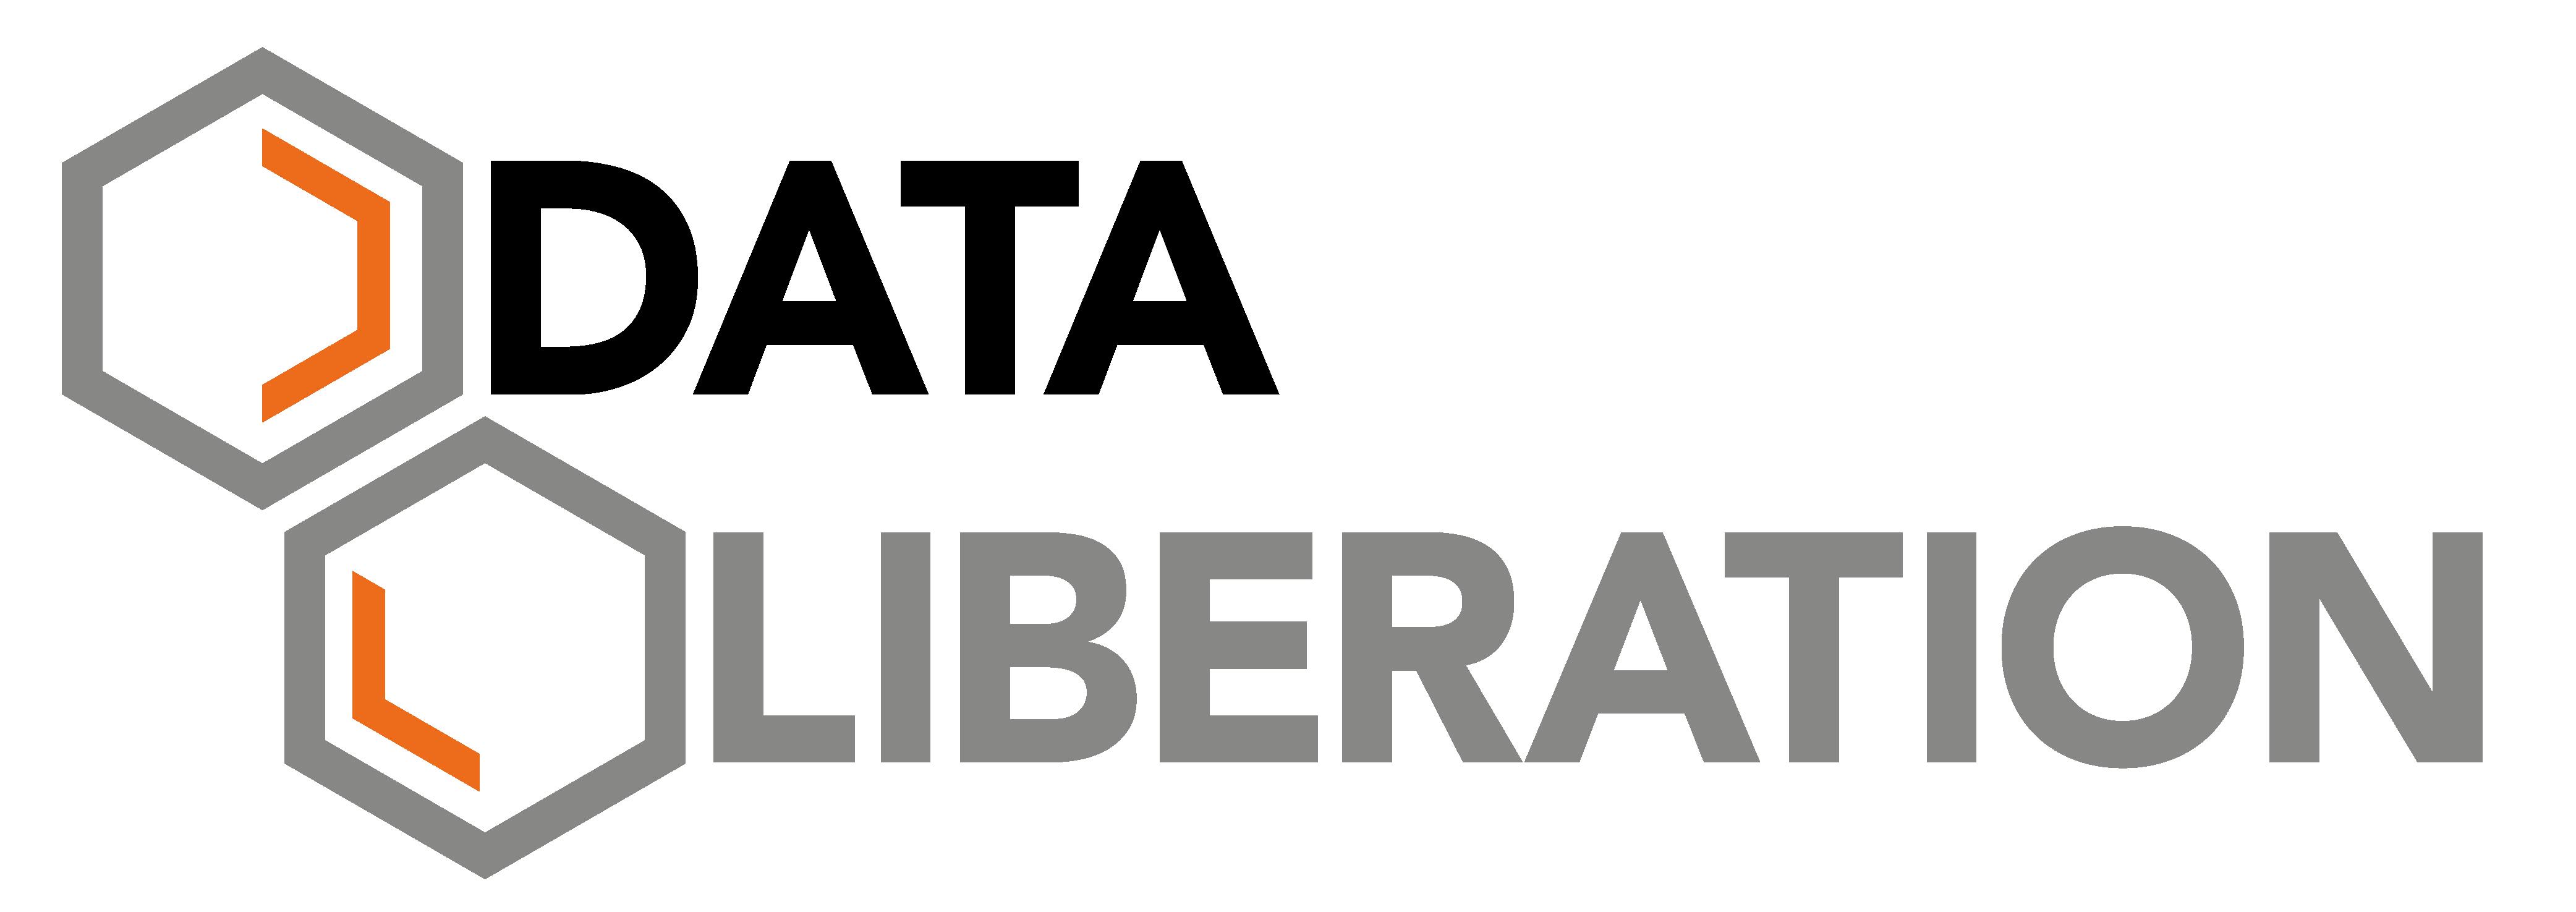 Data Liberation Logo